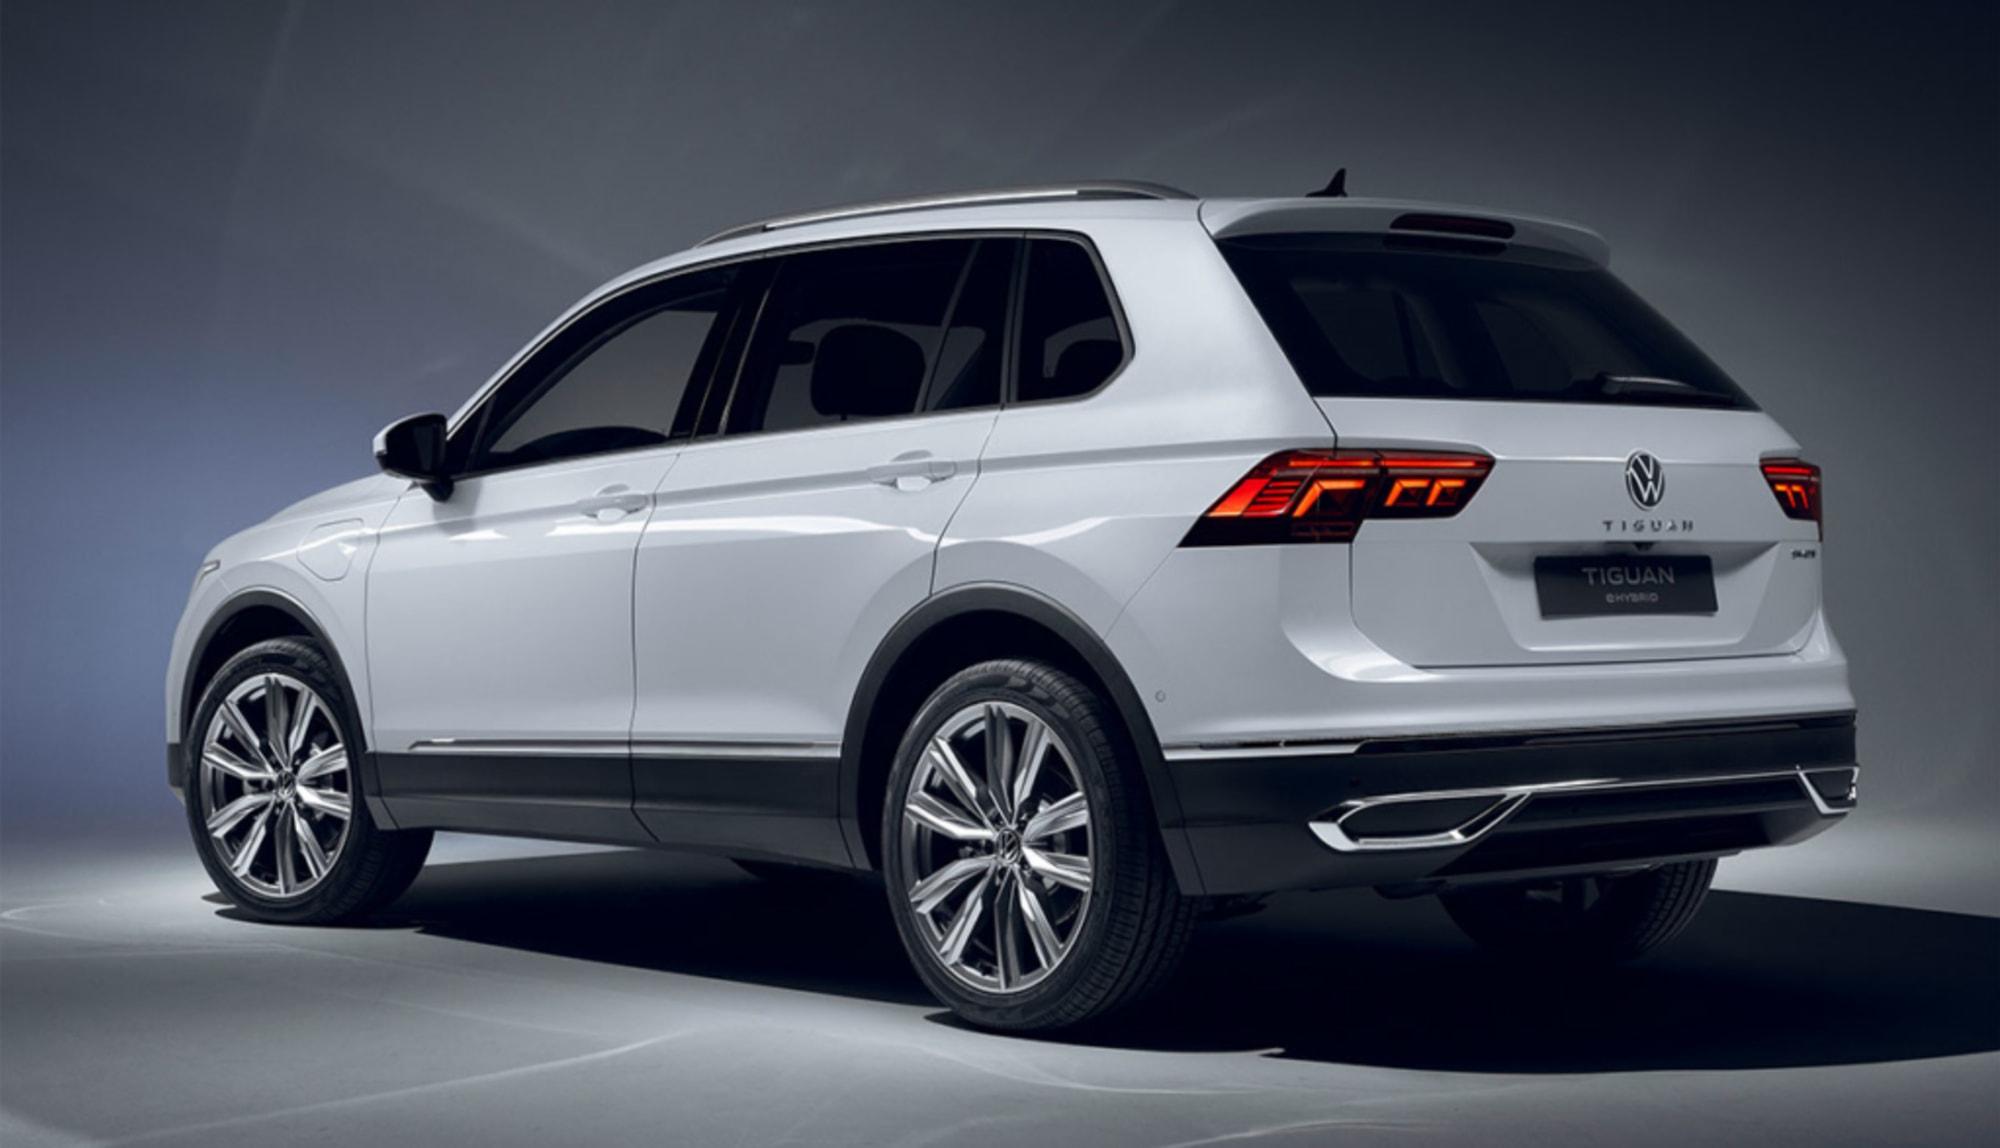 VW-Tiguan-eHybrid-20202-1024x588[1]